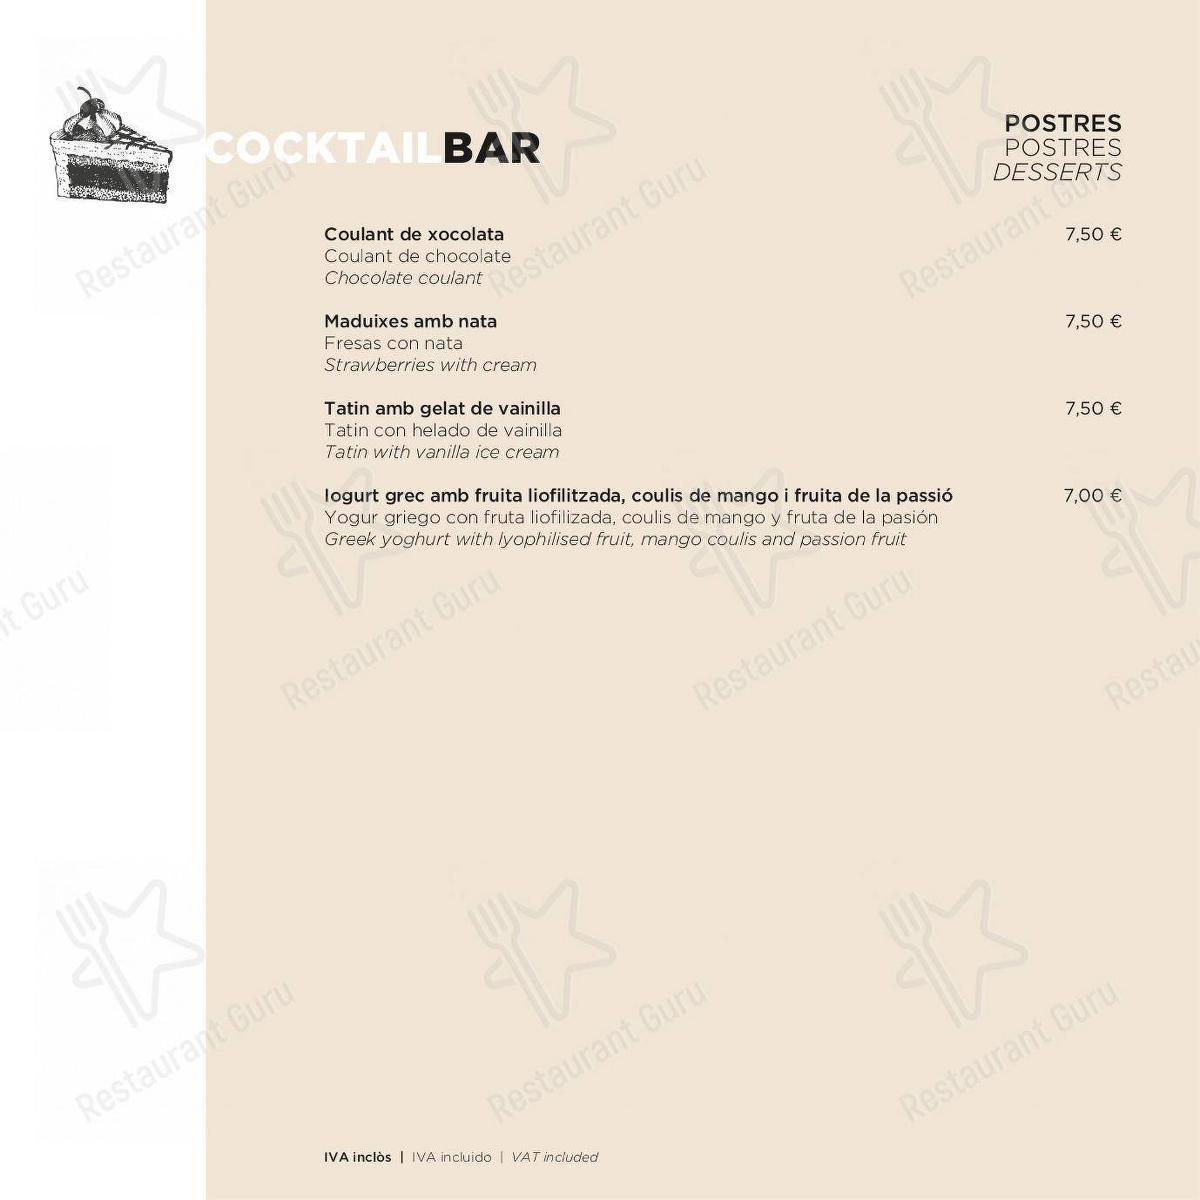 Cocktail Bar menu for the ECHO Restaurant restaurant